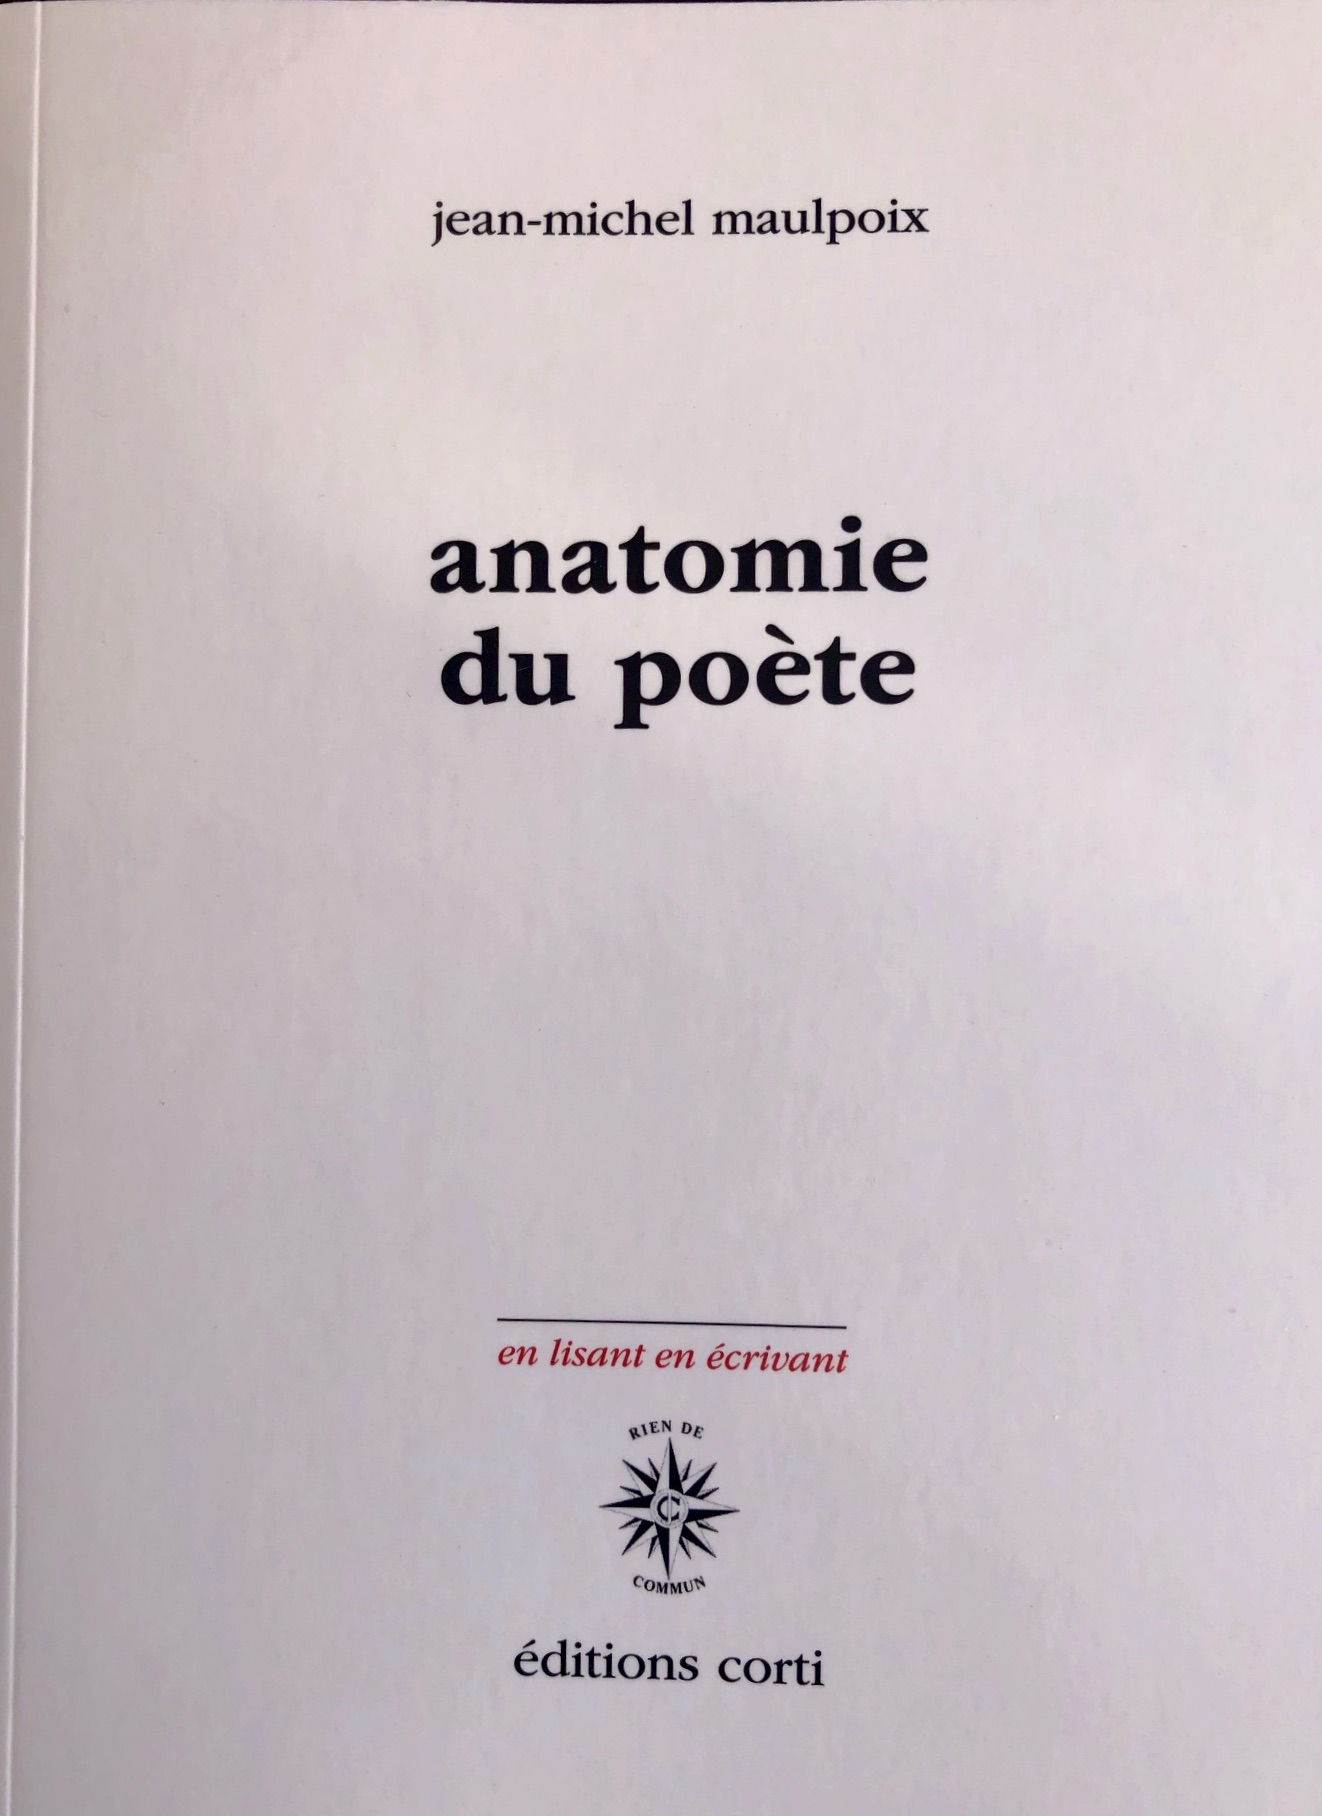 J.-M. Maulpoix, Anatomie du poète